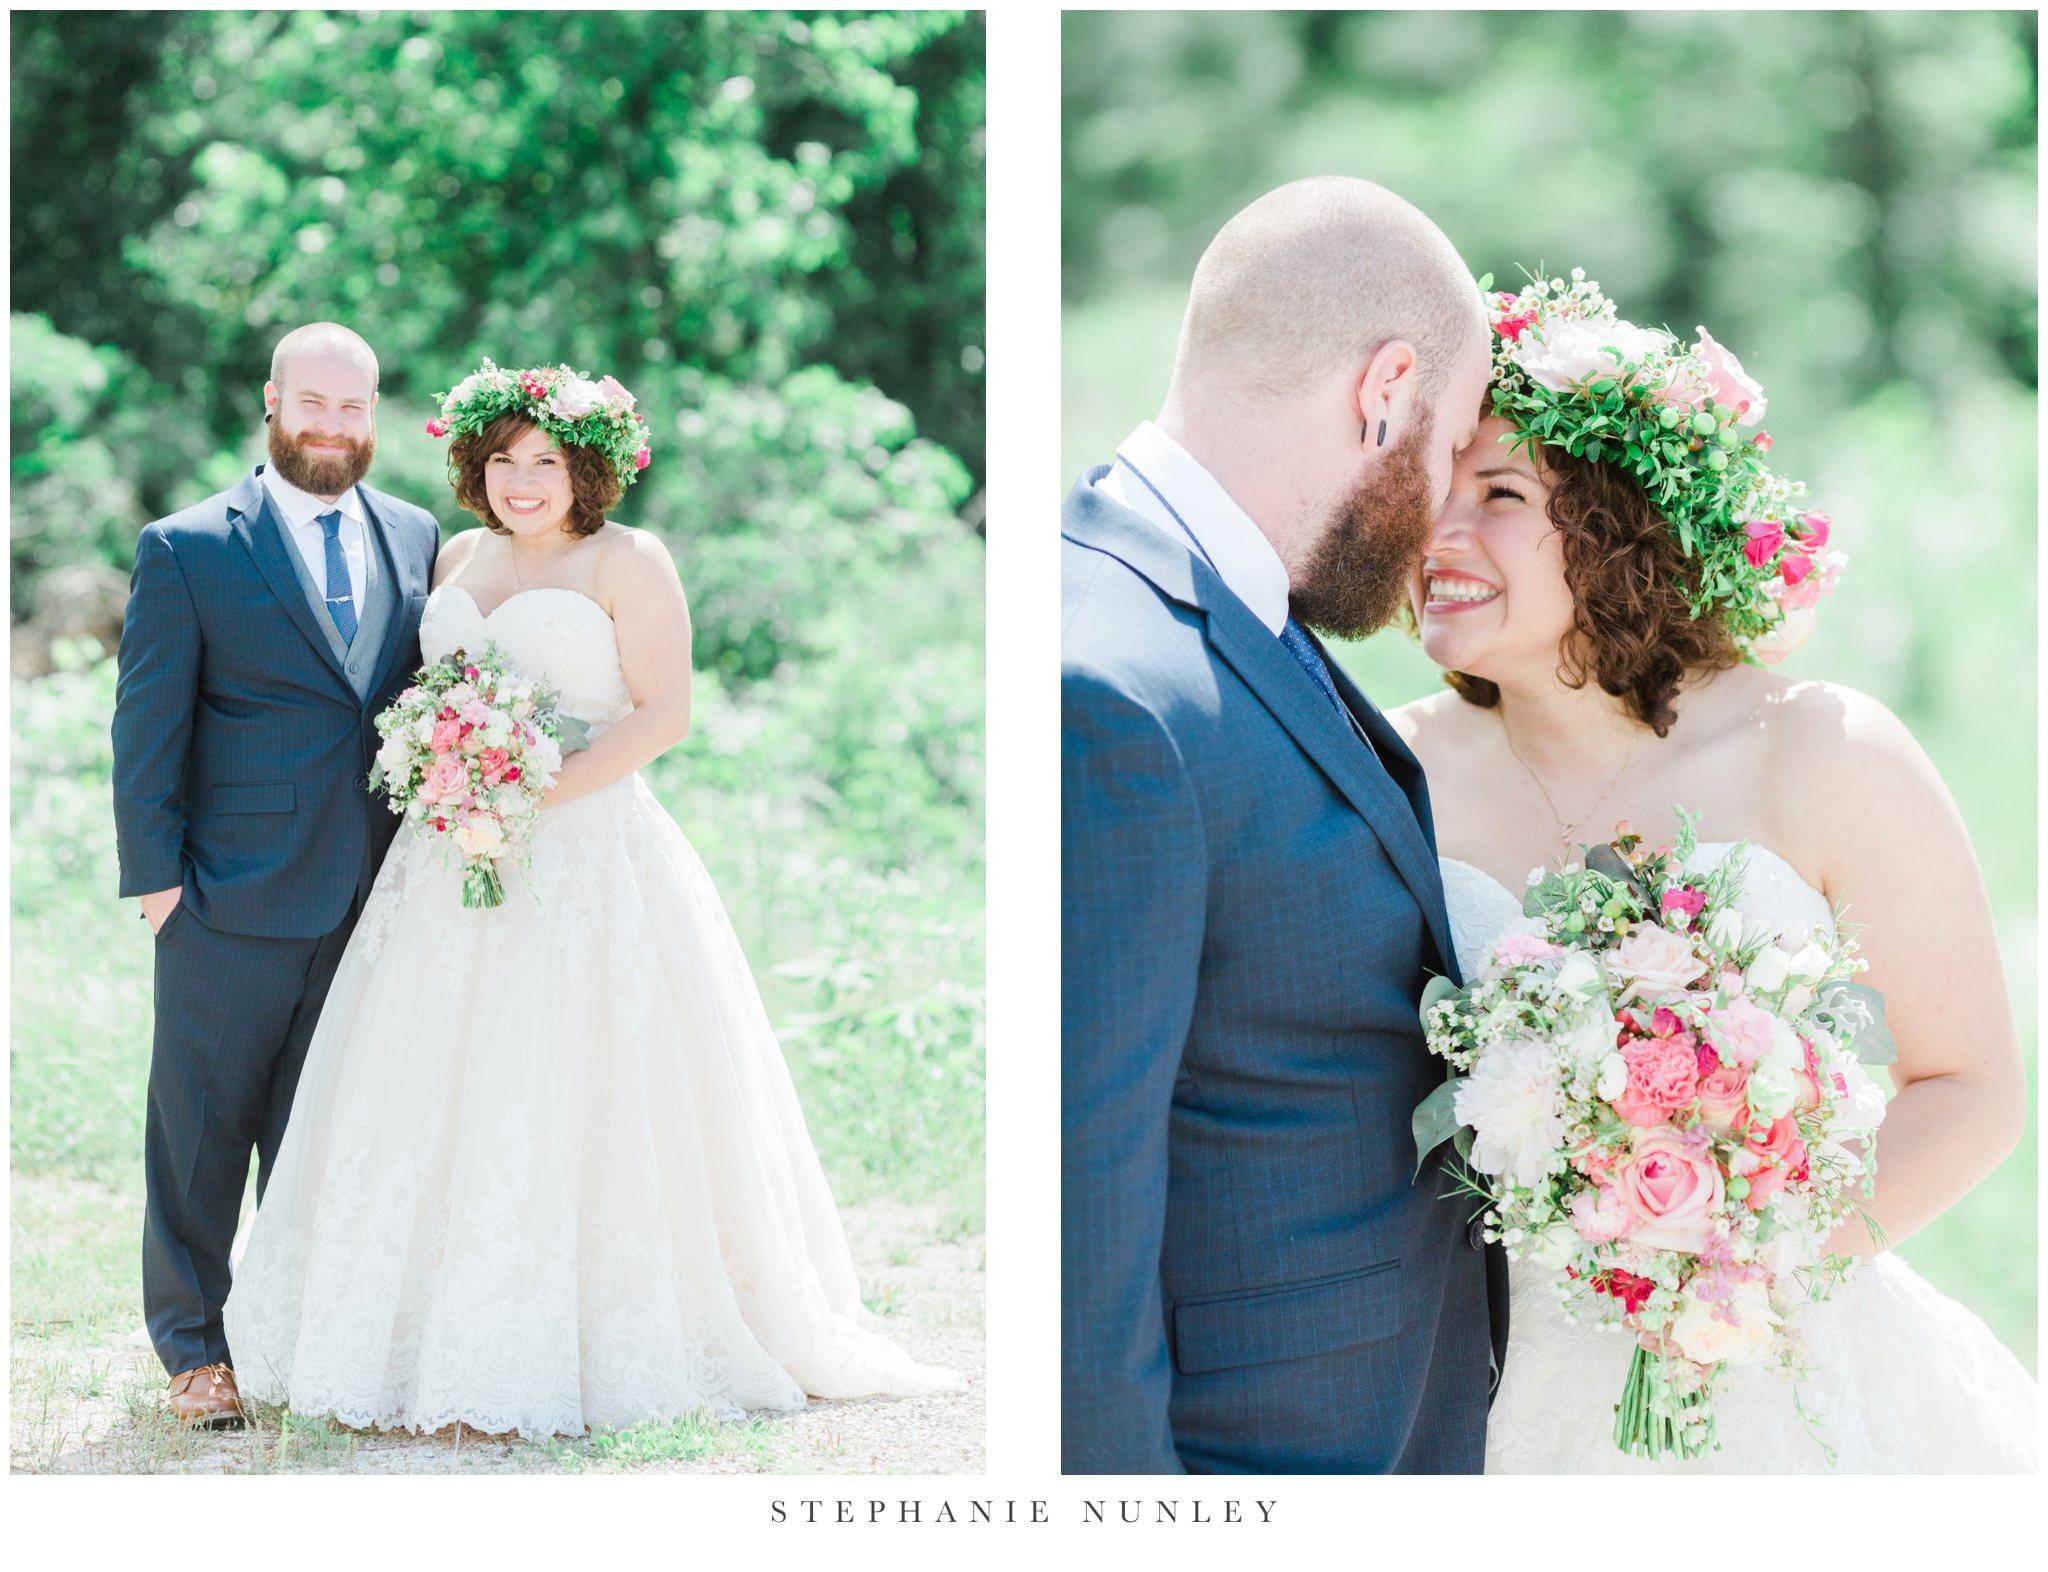 romantic-outdoor-wedding-with-flower-crown-0032.jpg